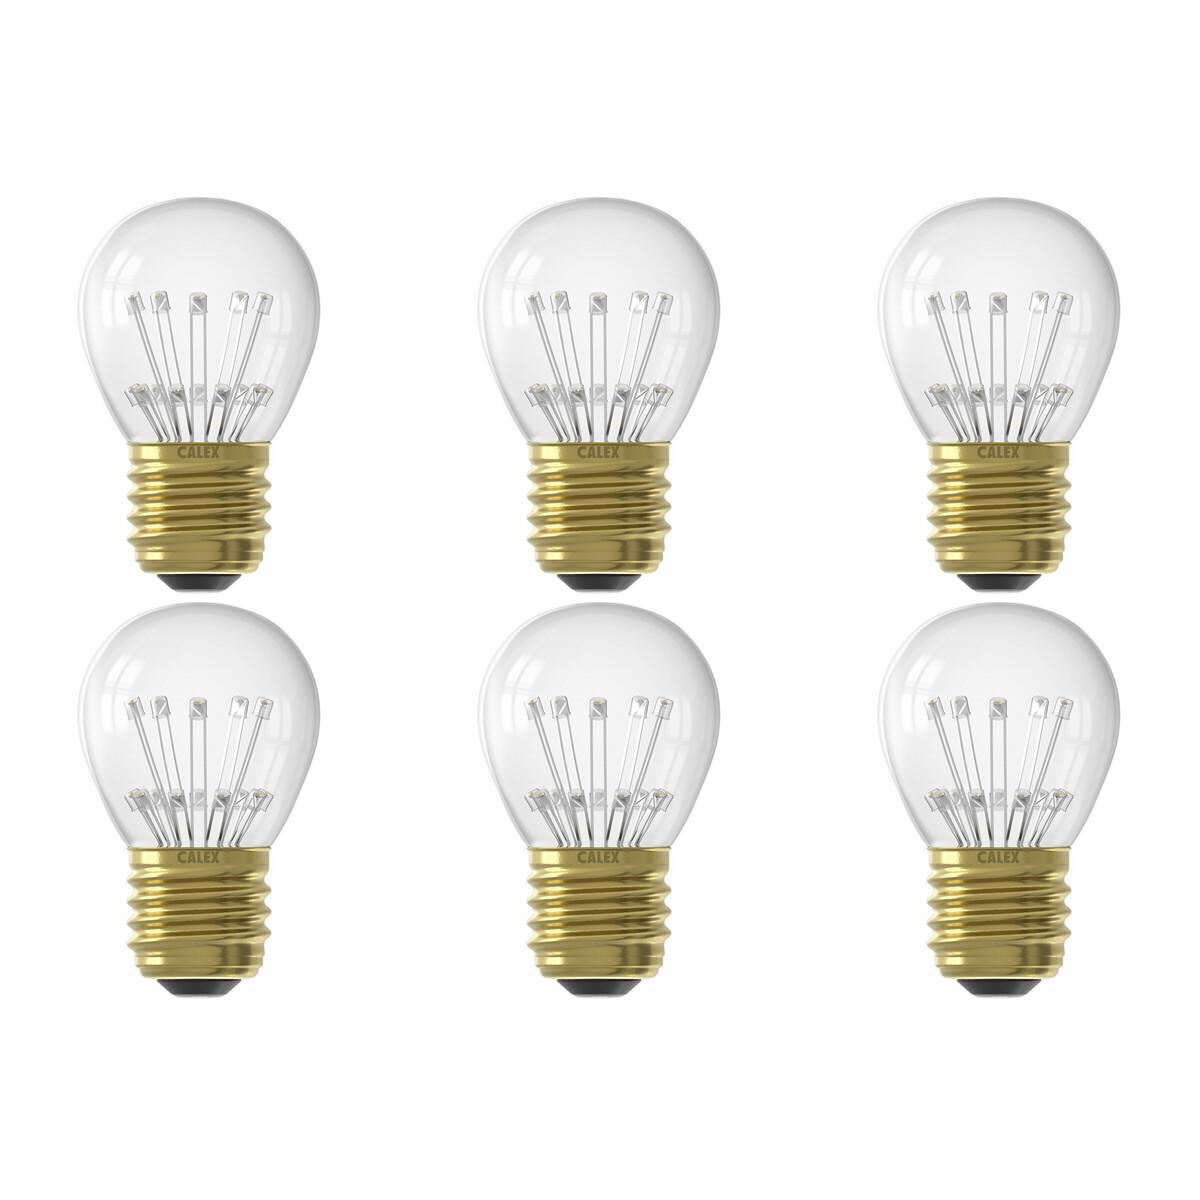 CALEX - LED Lamp 6 Pack - Kogellamp P45 - E27 Fitting - 1W - Warm Wit 2100K - Transparant Helder